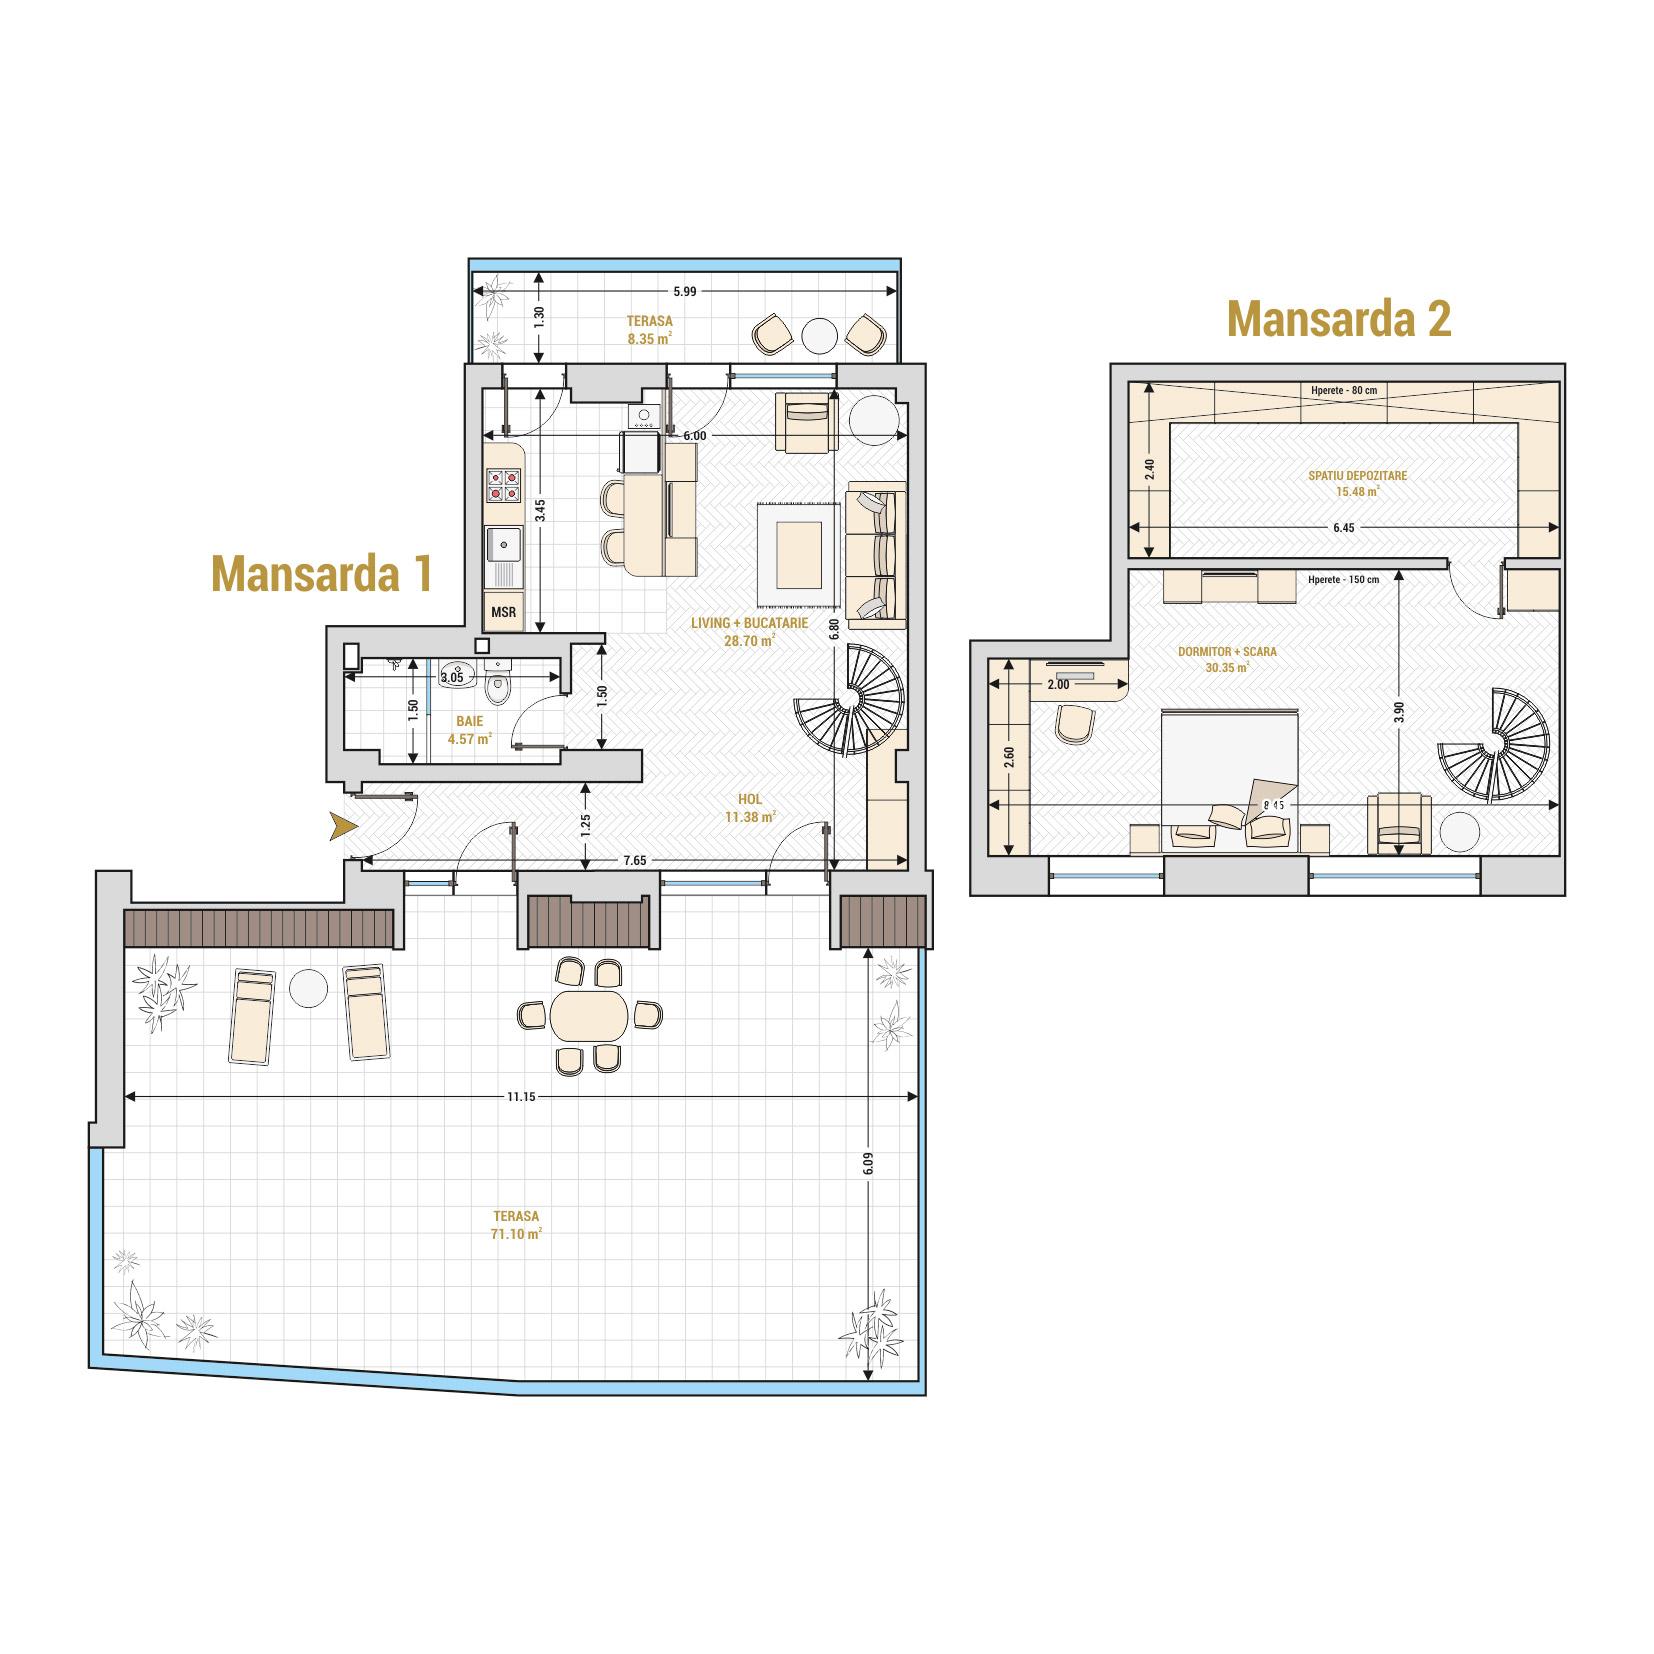 Duplex cu 2 camere de vanzare Bucuresti - Catedral Residence - Marriott, Piata Unirii, 13 Septembrie, Izvor - Tip 4 - T1A